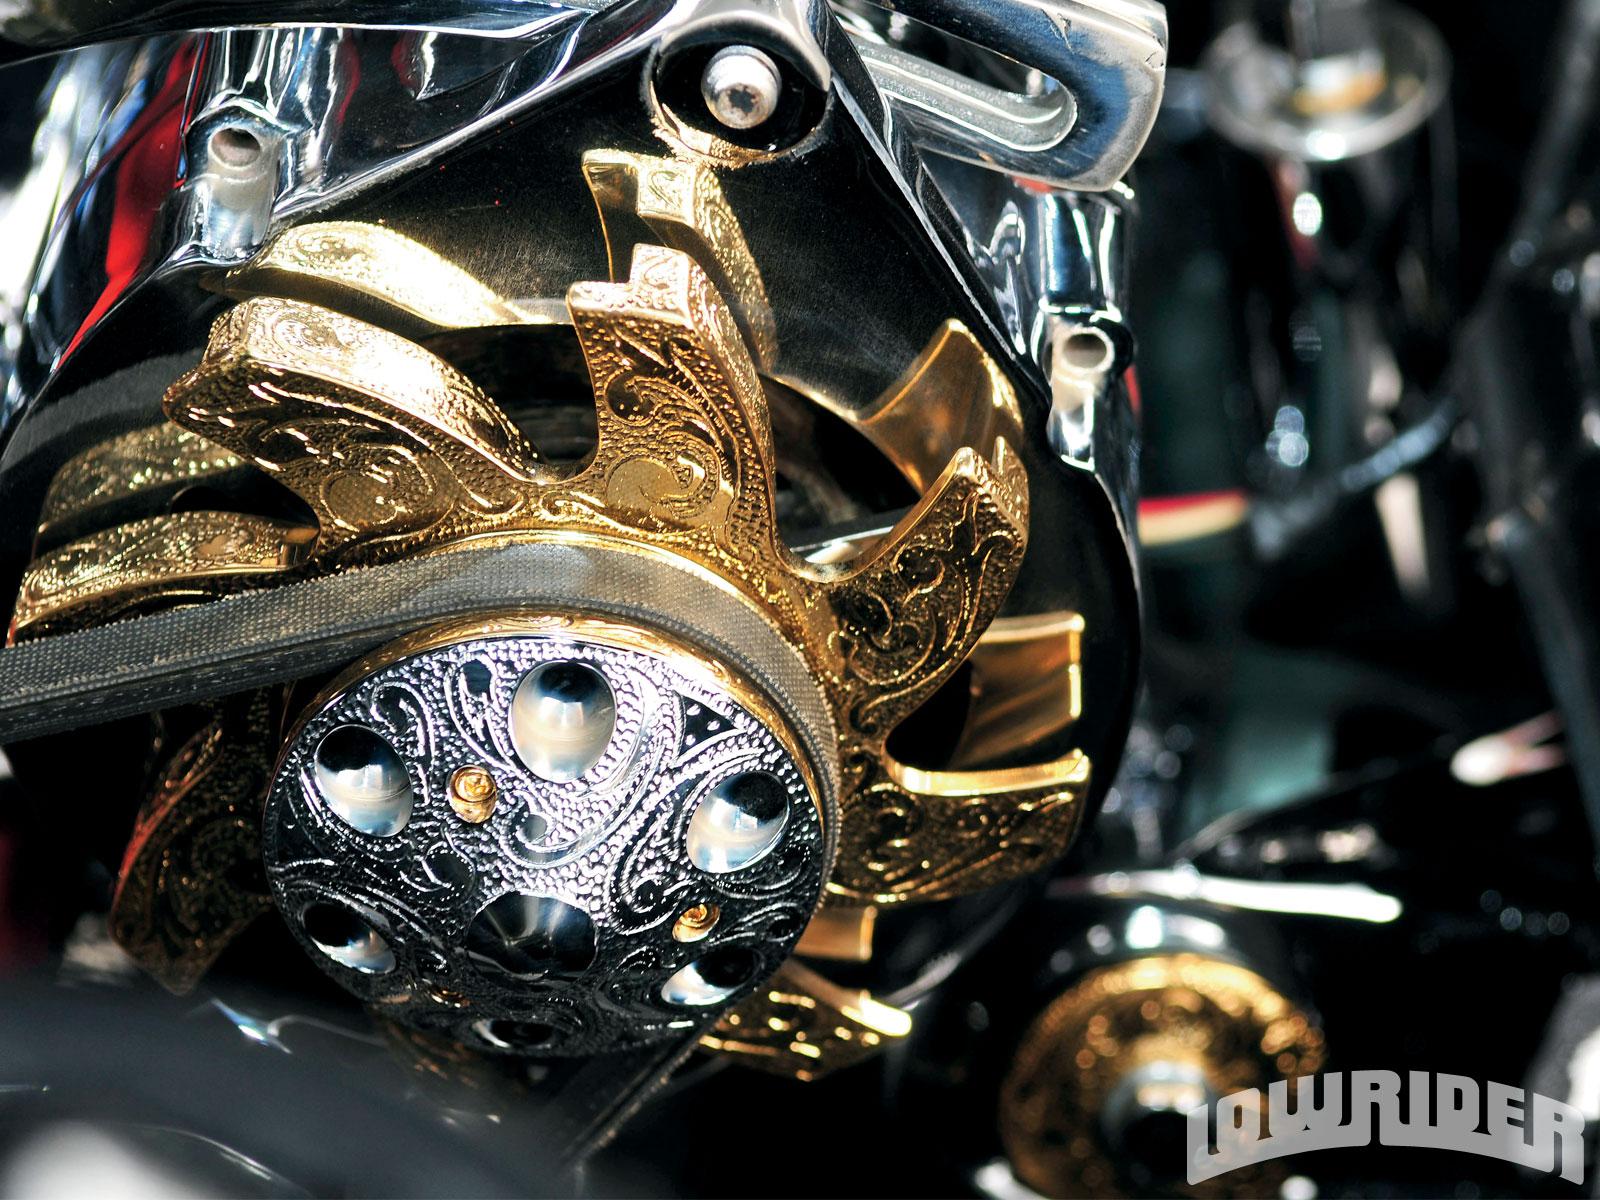 David Renteria Master Engraver Lowrider Magazine